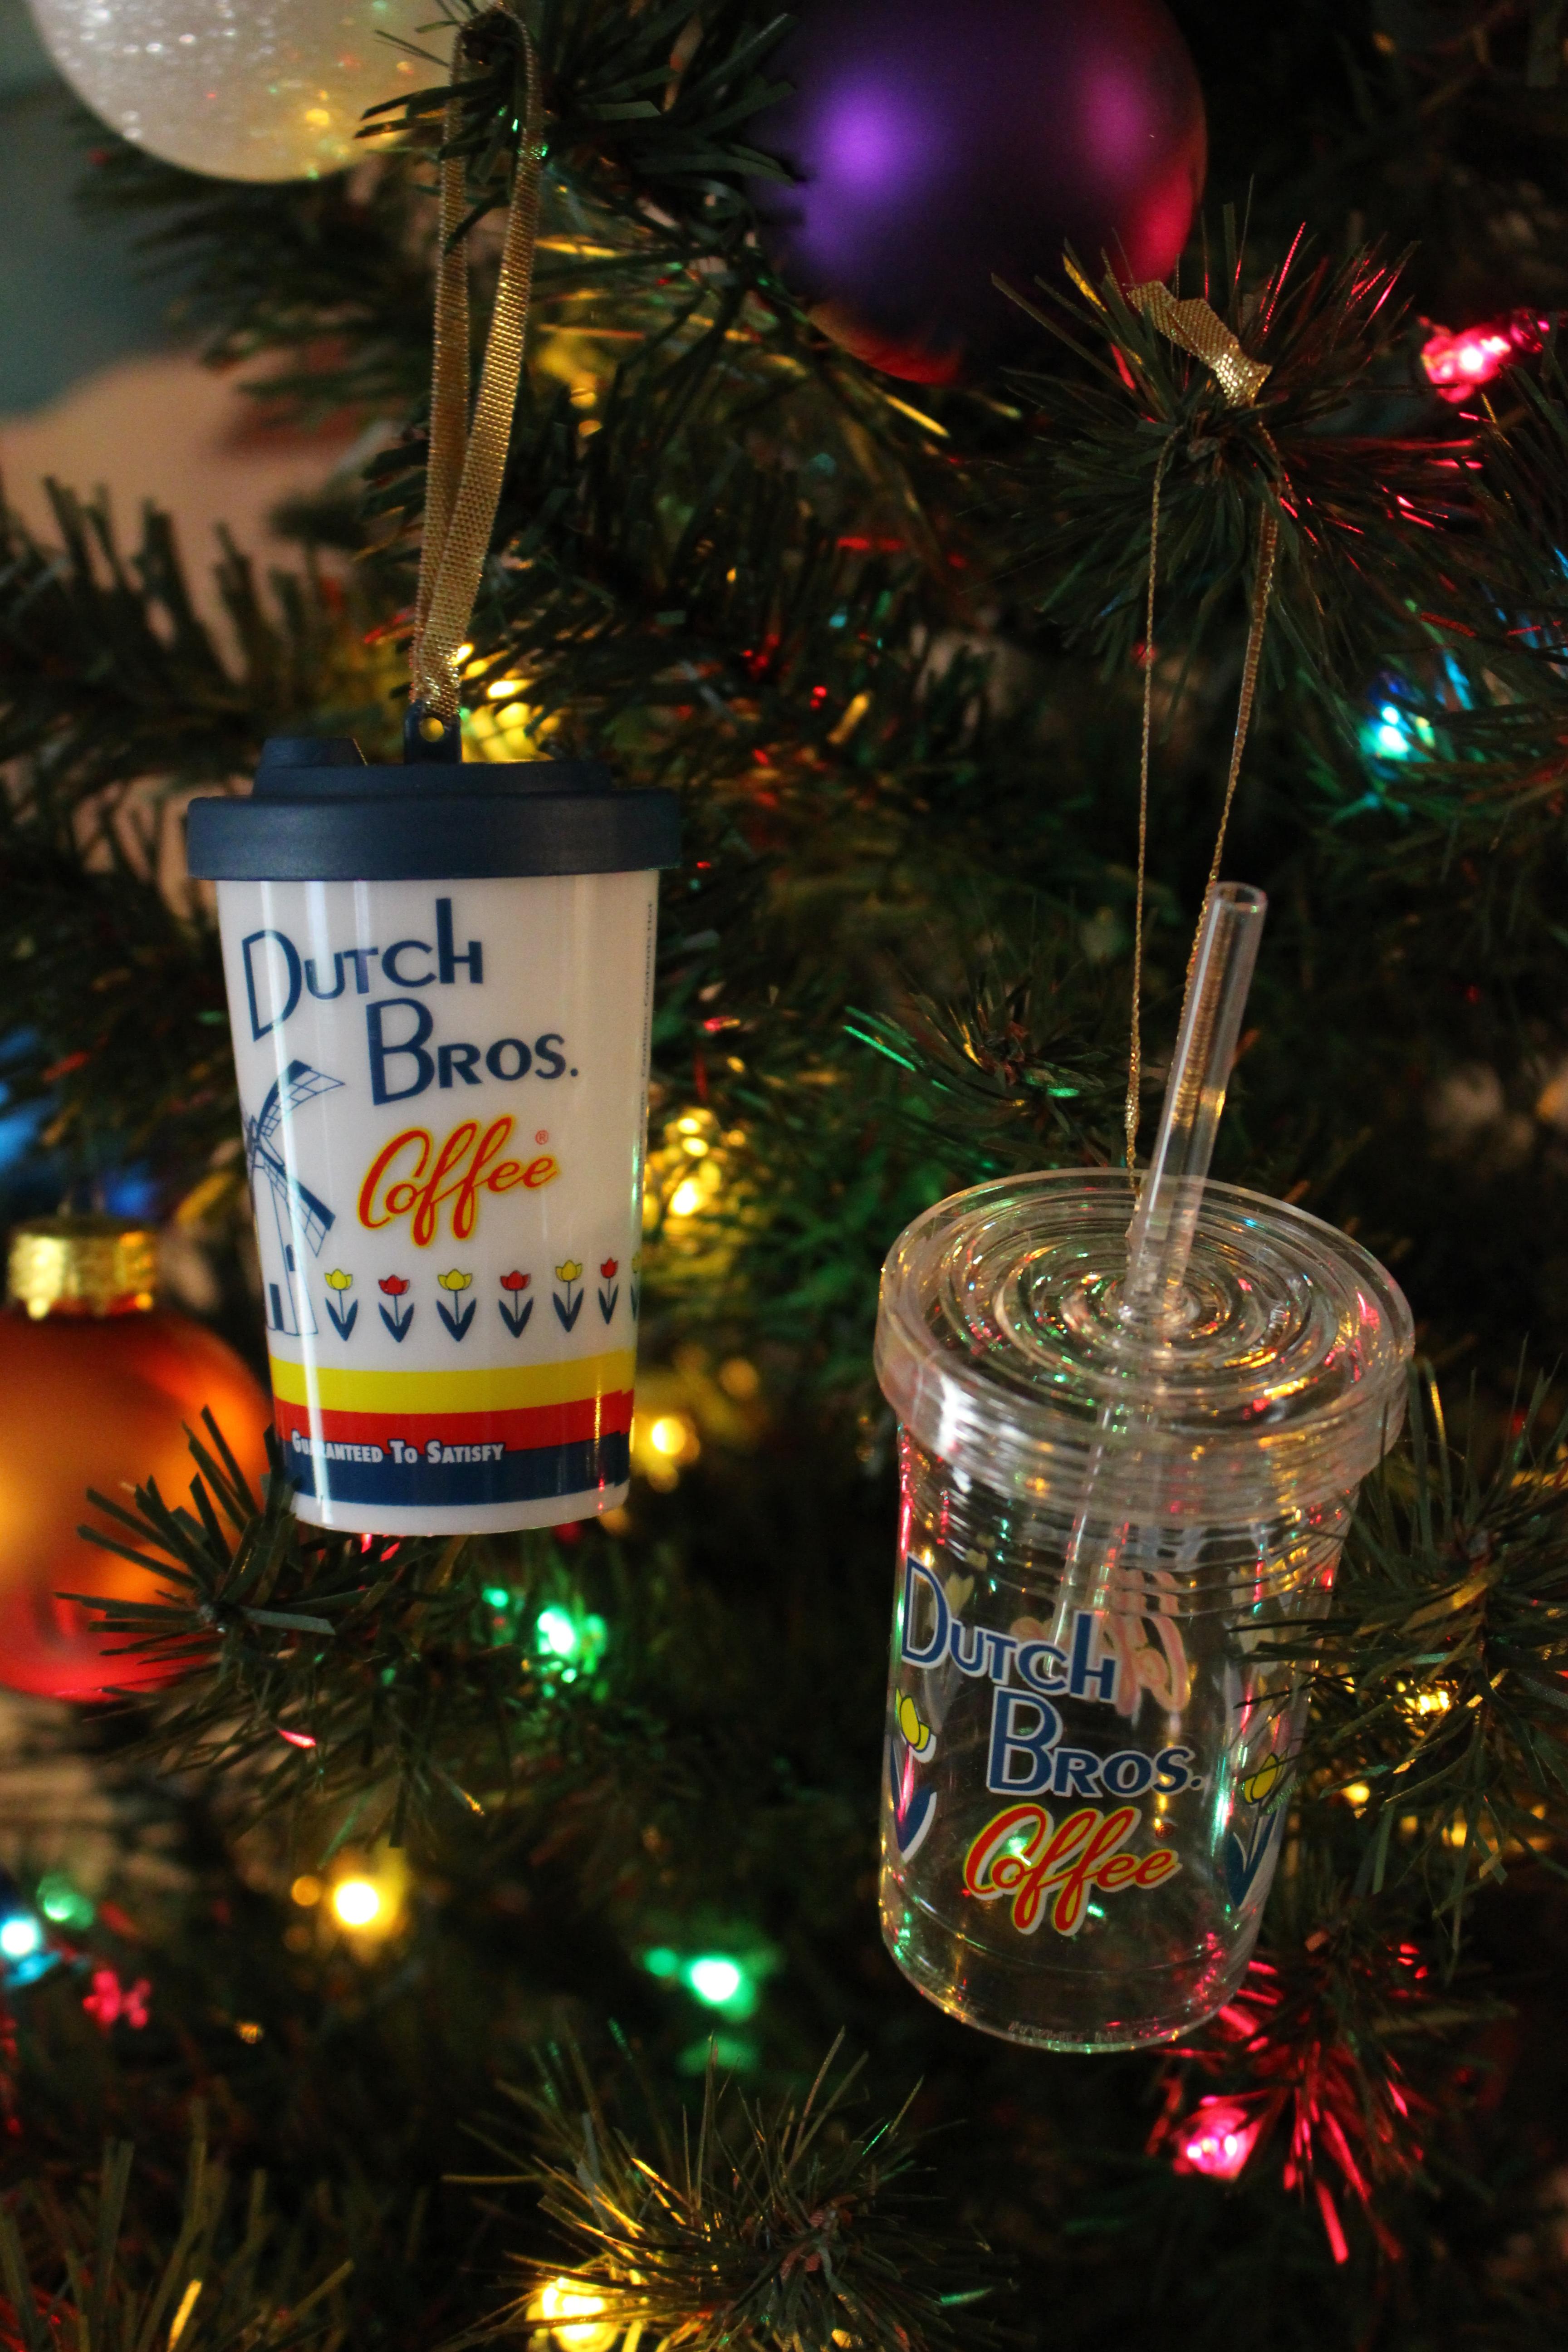 Coffee Christmas Ornaments.Dutch Bros Coffee Ornaments 2013 2015 2016 Coffee